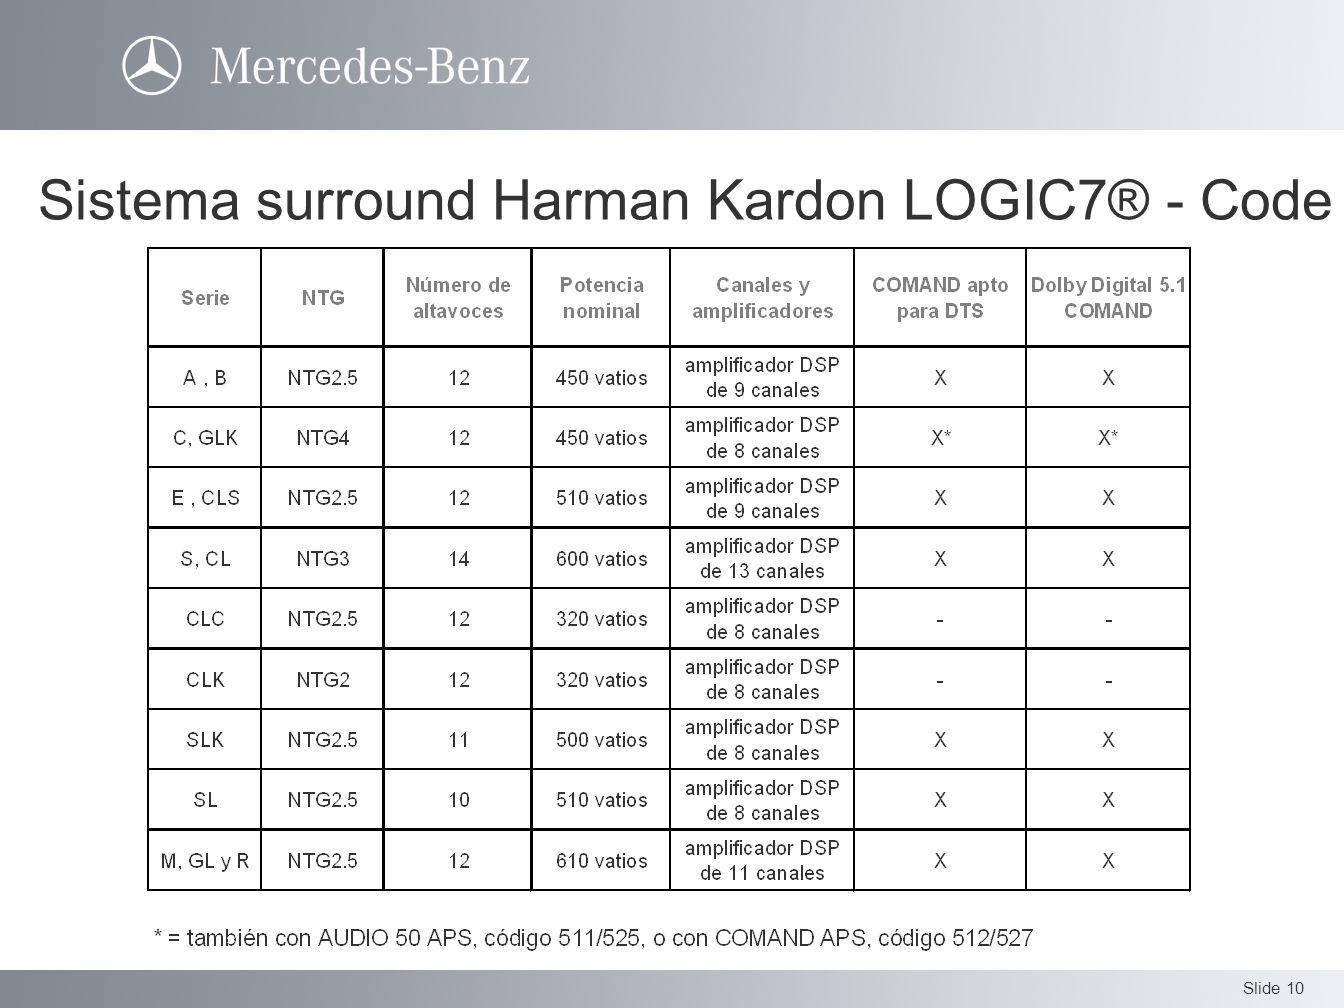 Sistema surround Harman Kardon LOGIC7® - Code 810